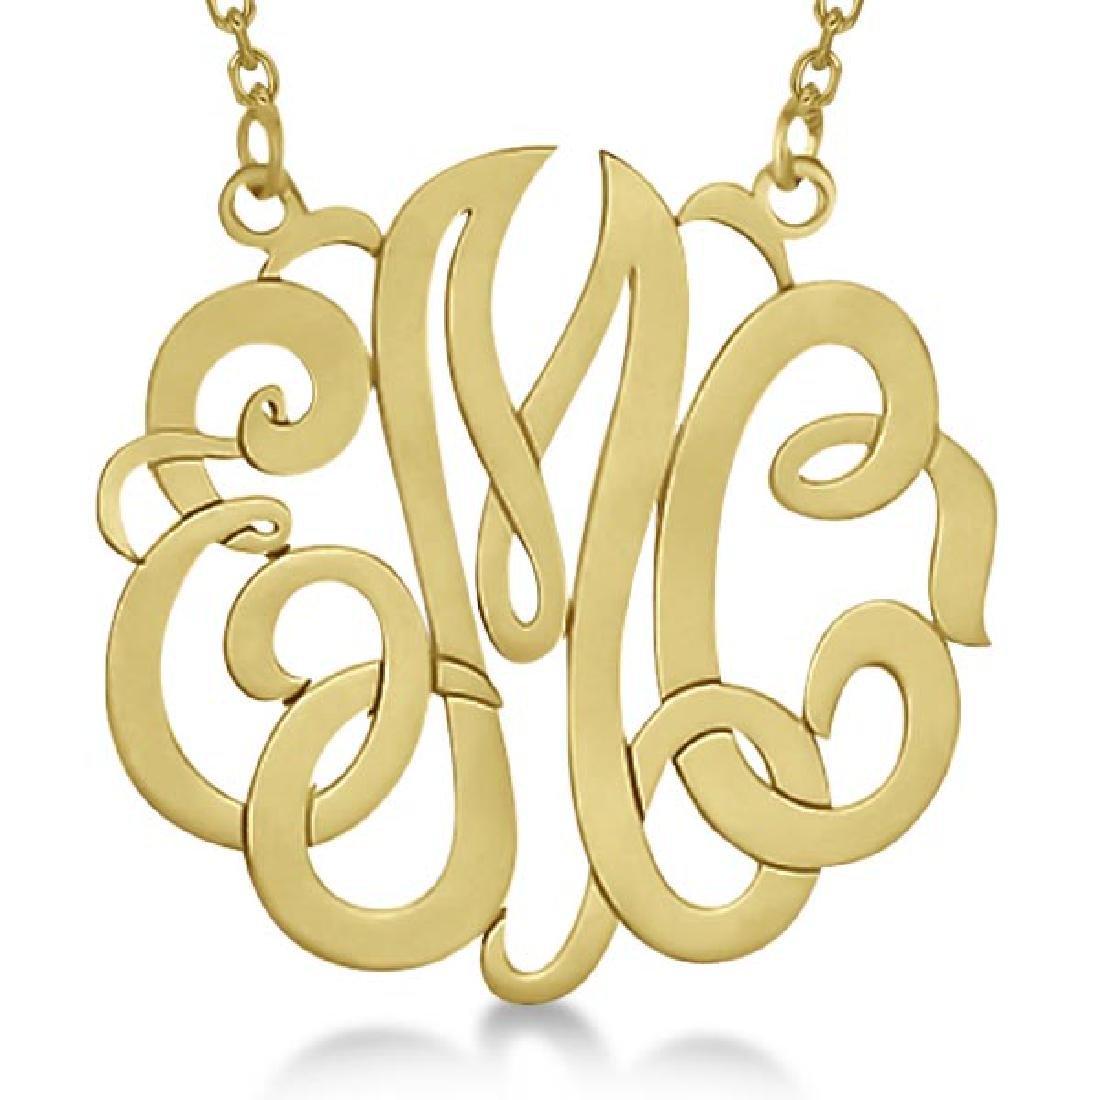 Personalized Monogram Pendant Necklace in 14k Yellow Go